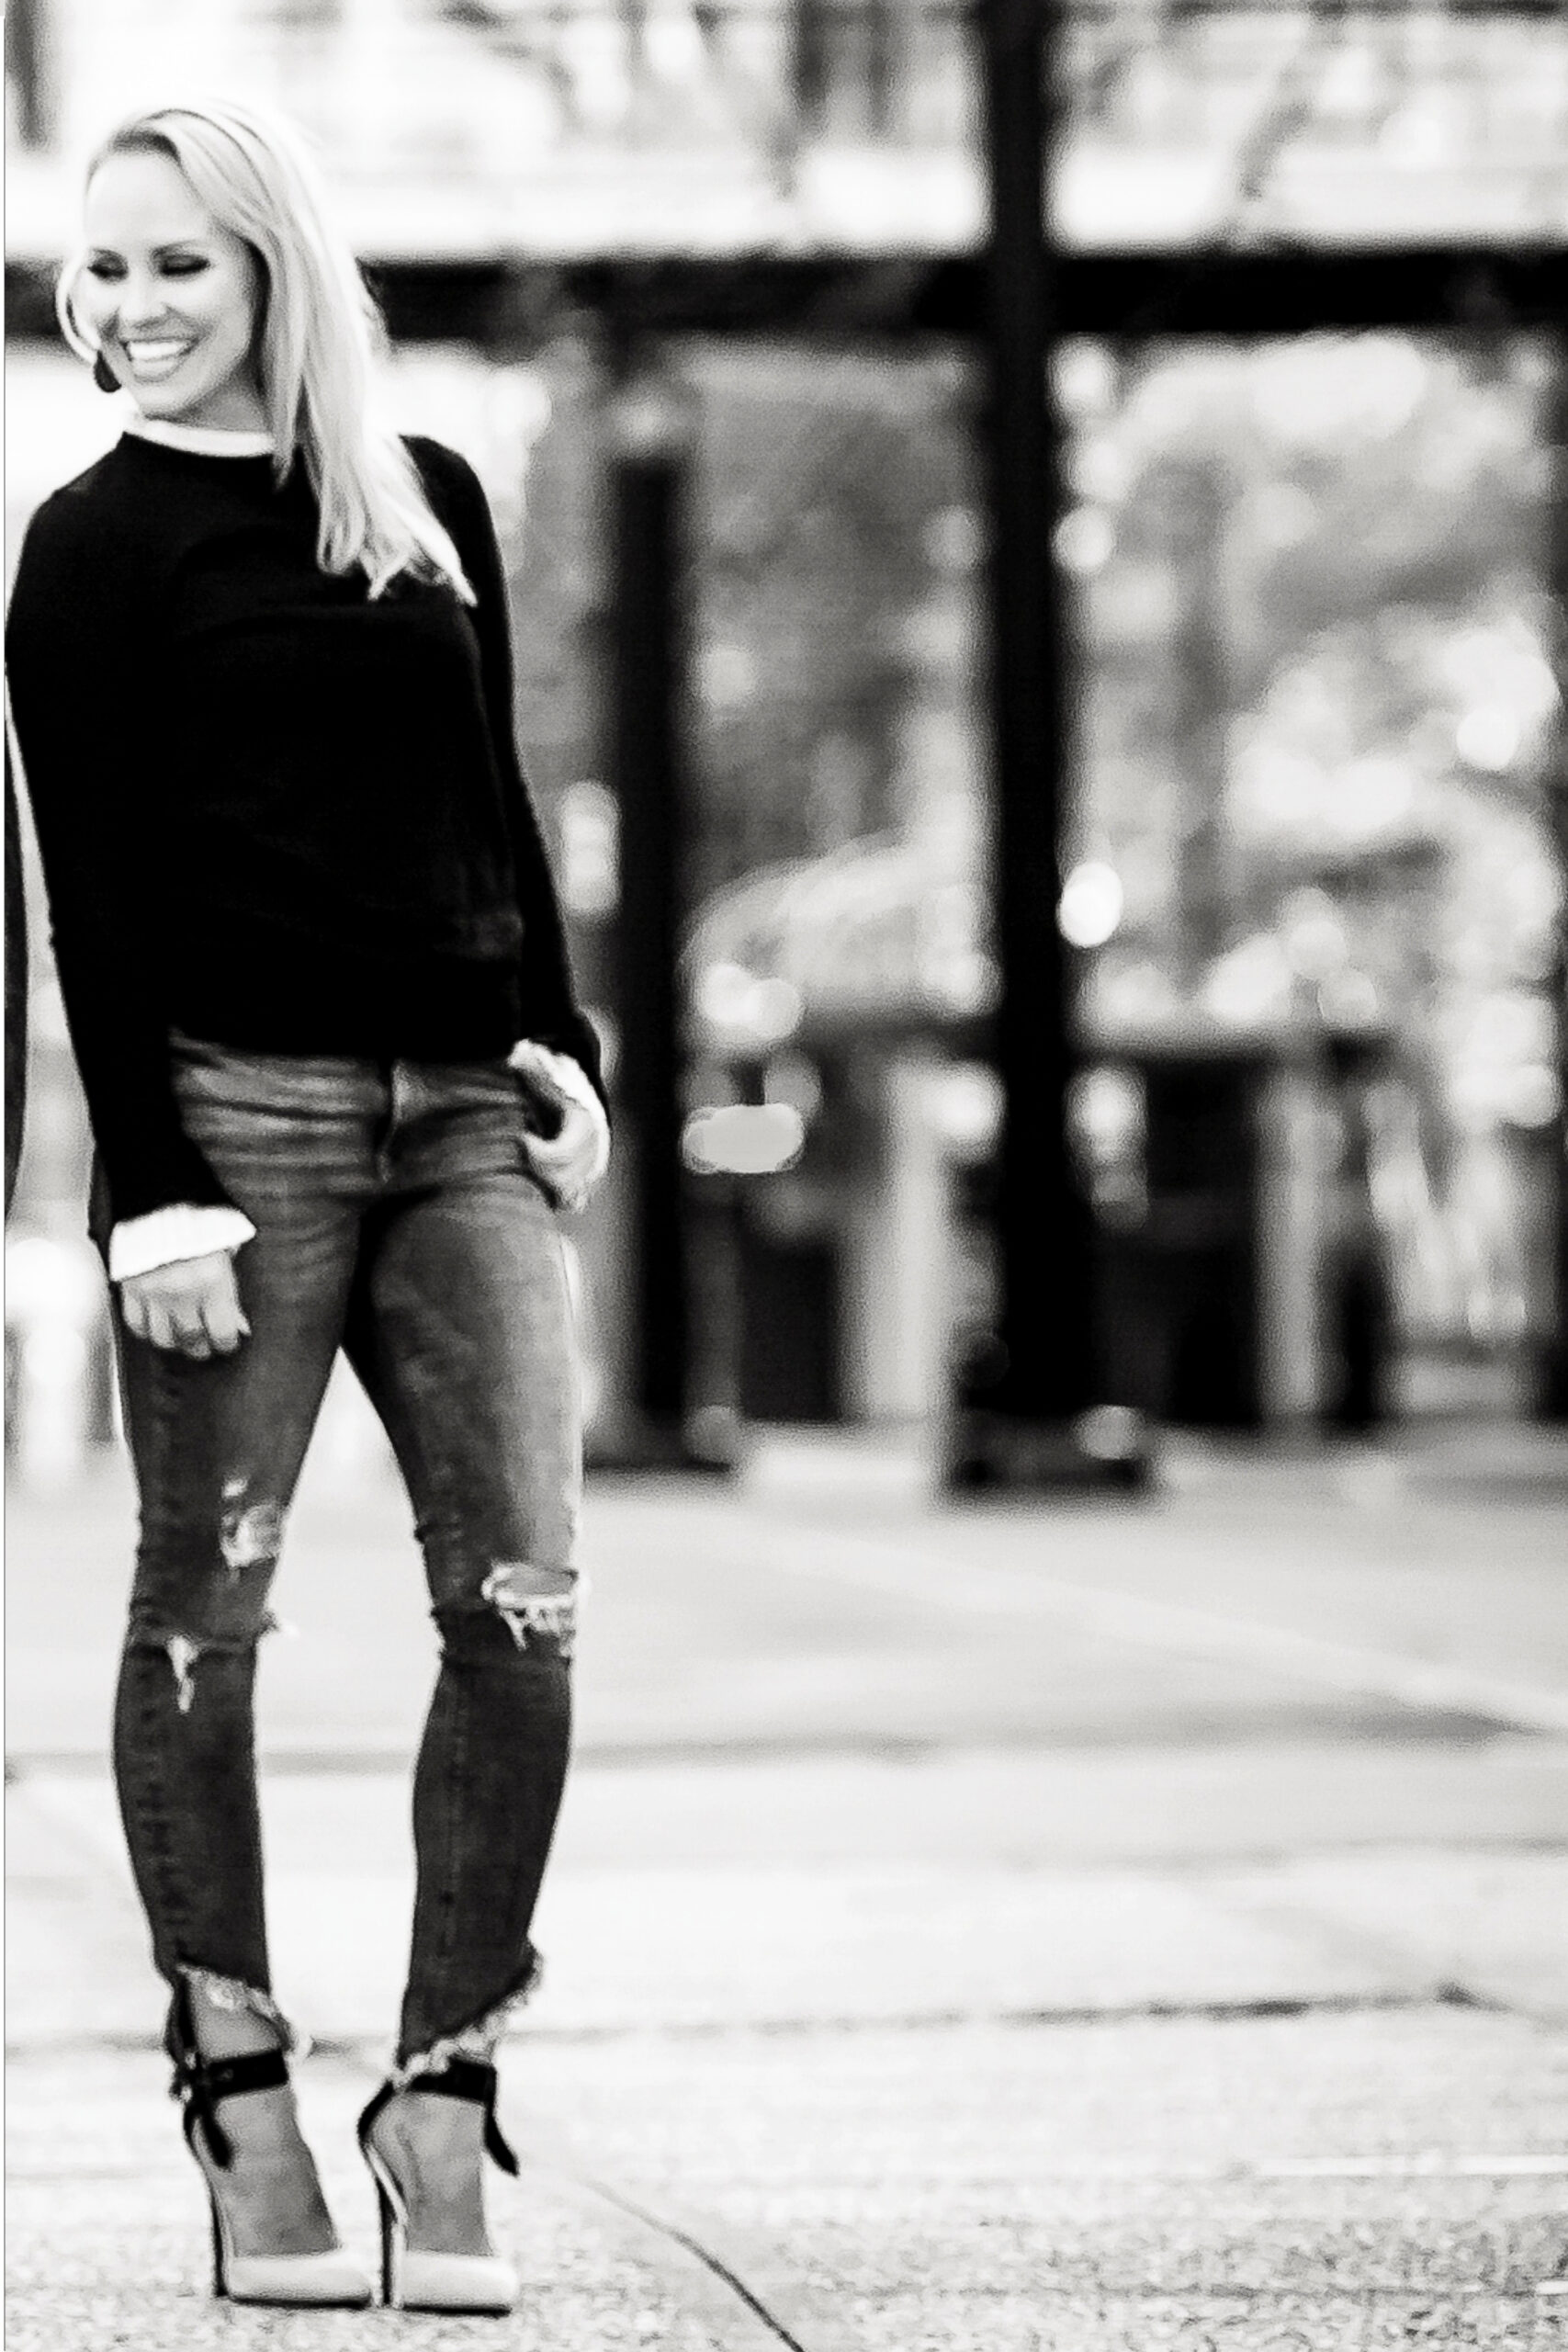 Sandra in black and white